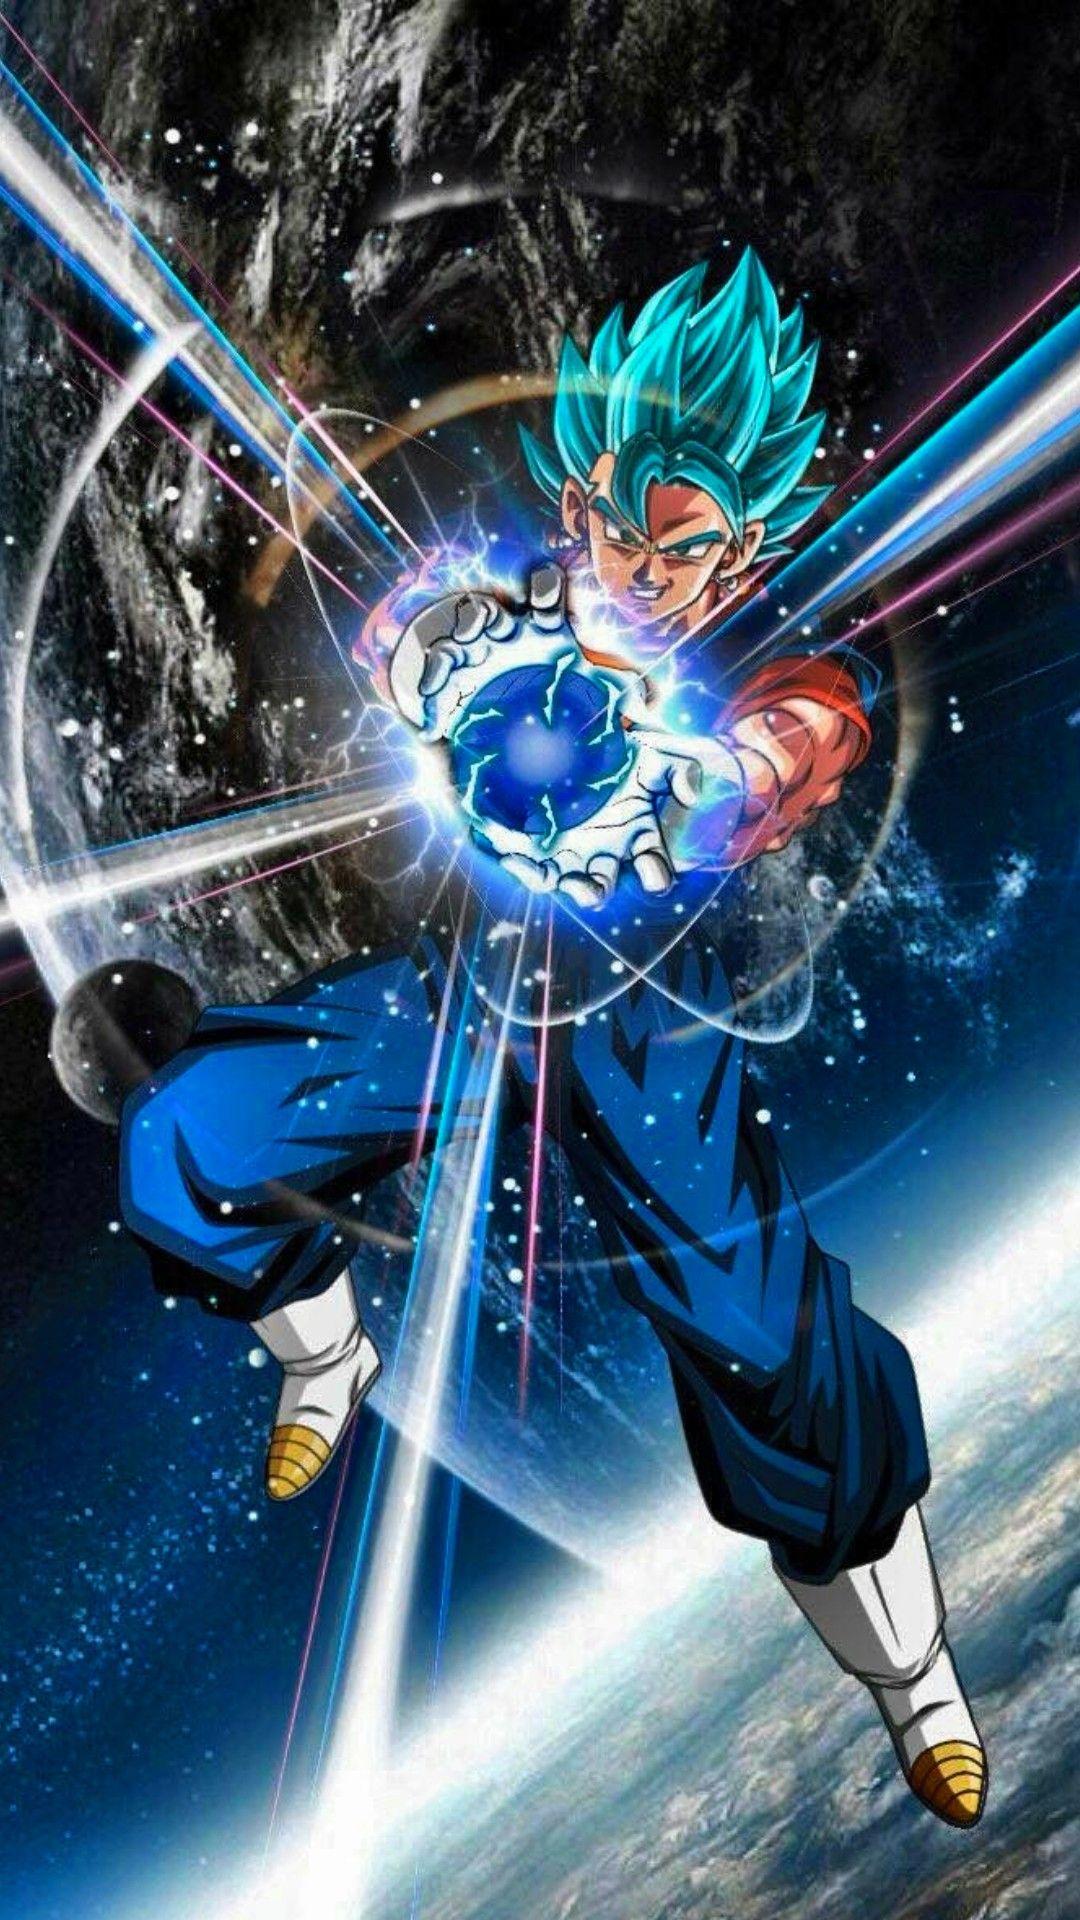 Vegito Ssj Blue Anime Dragon Ball Super Dragon Ball Super